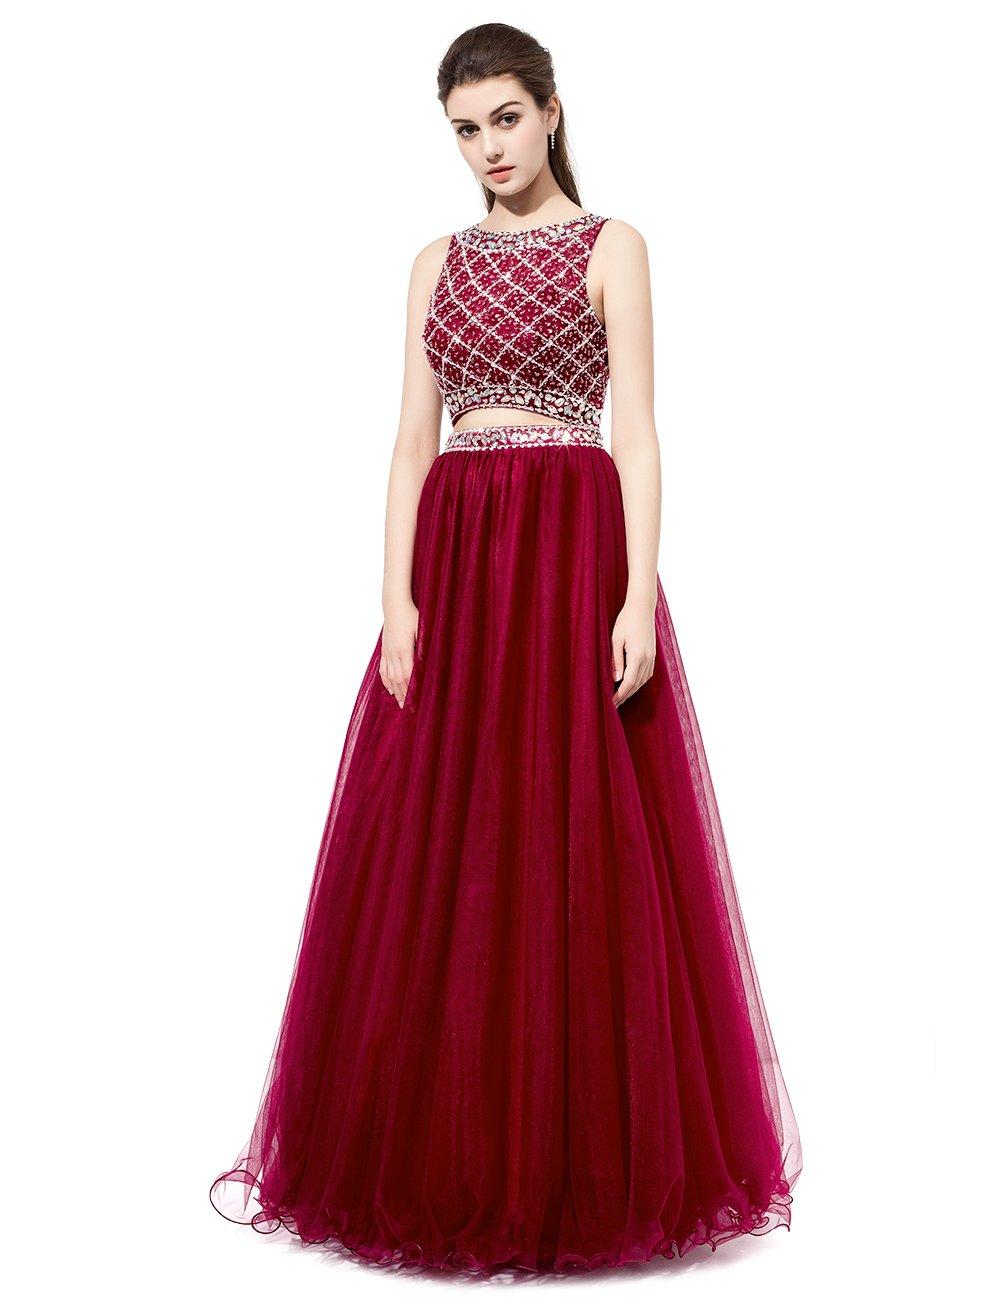 2 Pc Prom Dress: Amazon.com